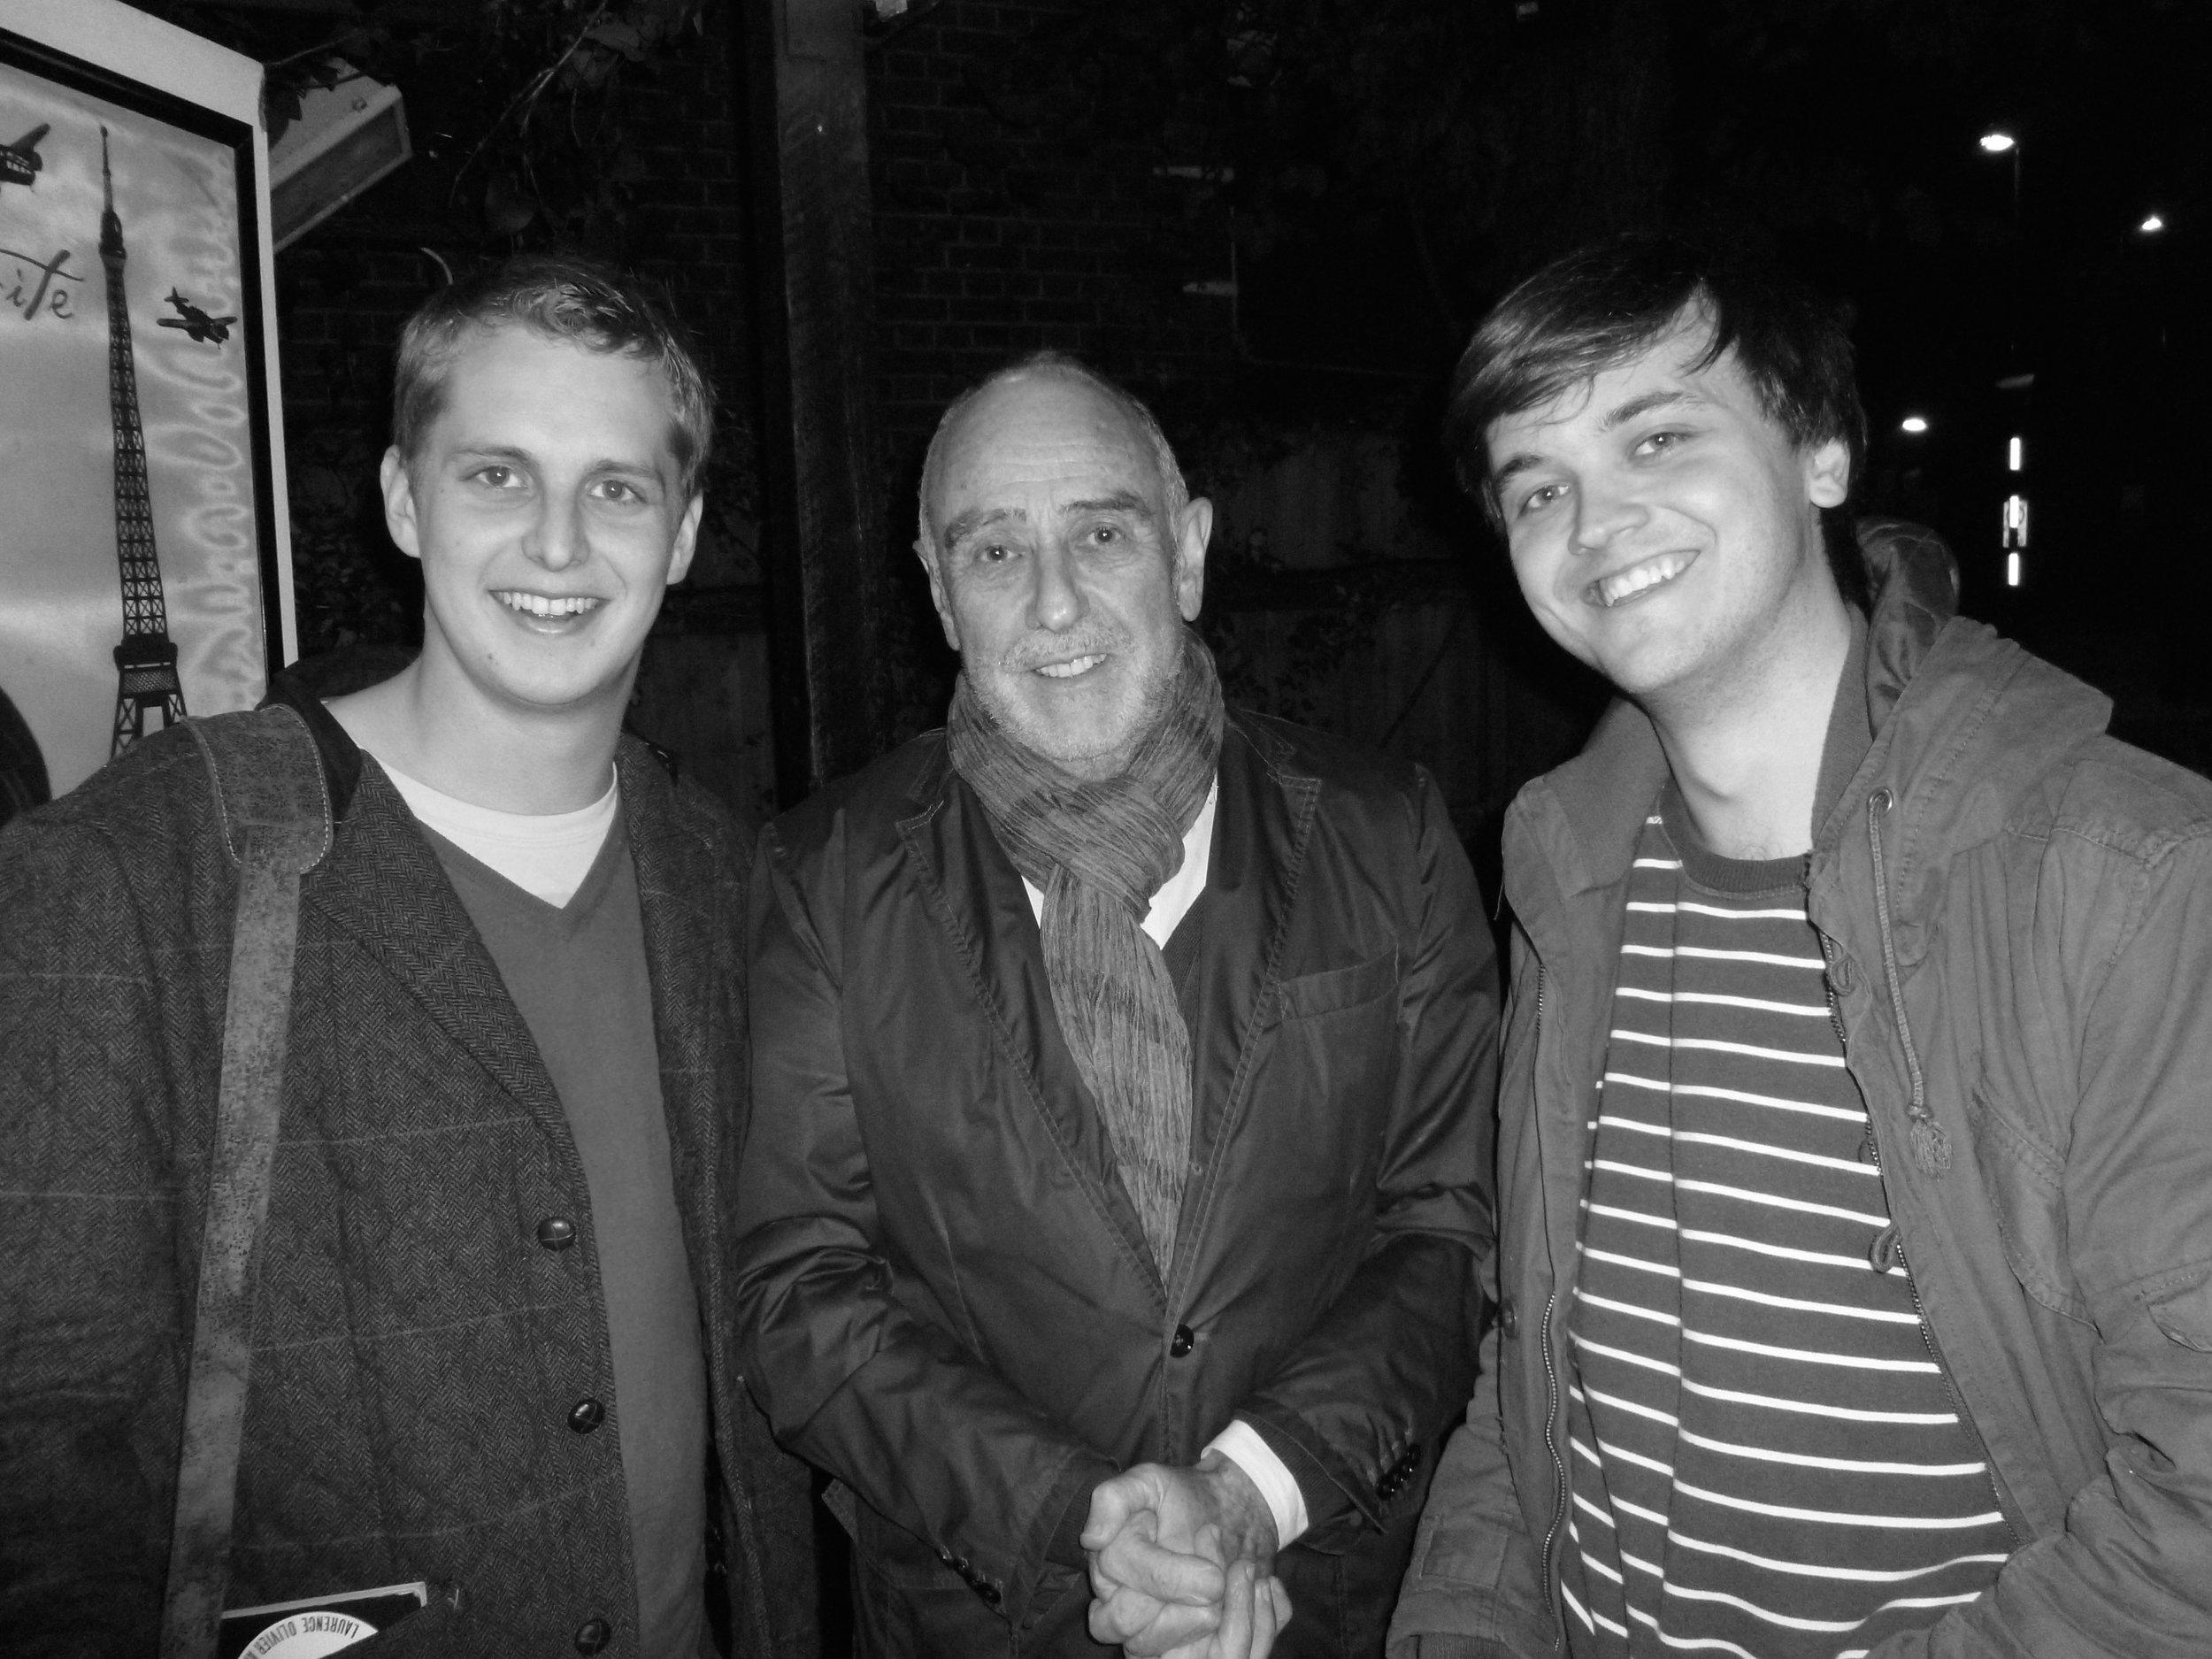 Guy Unsworth, Claude-Michel Schönberg & Jude Obermüller (Press Night 2012)